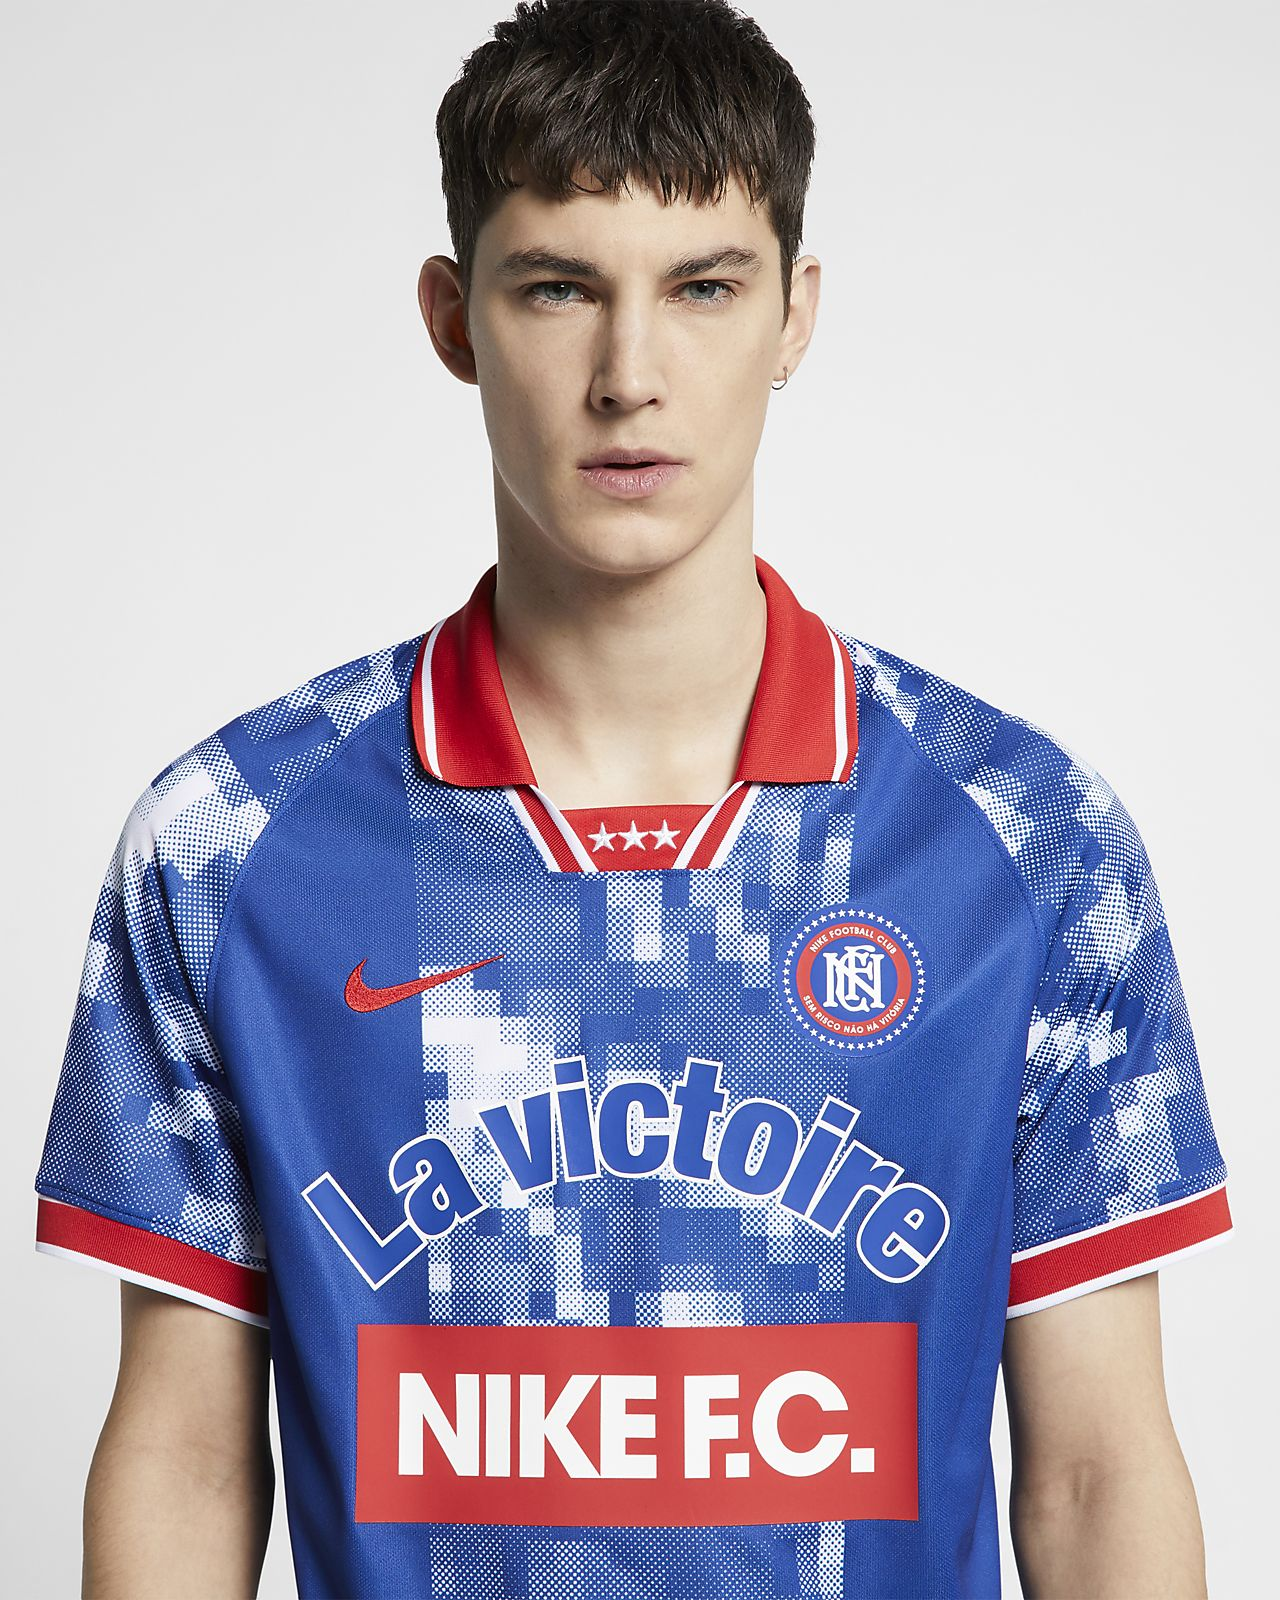 victoria nike shirt victoria shirt nike t t victoria